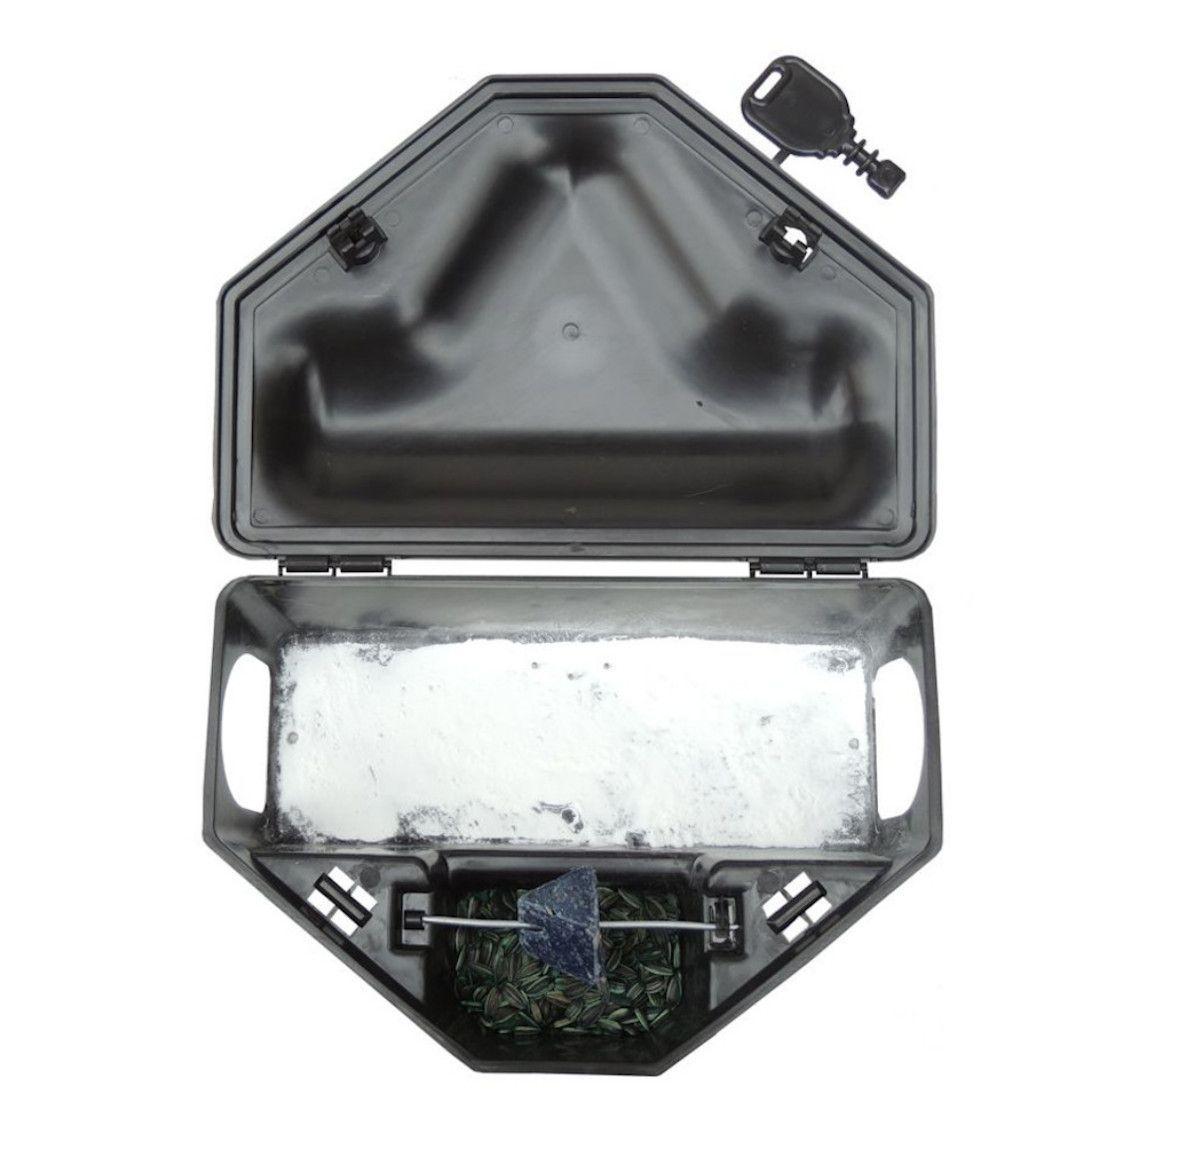 Kit 30 Porta Isca Com 2 Chaves - Duplo Travamento